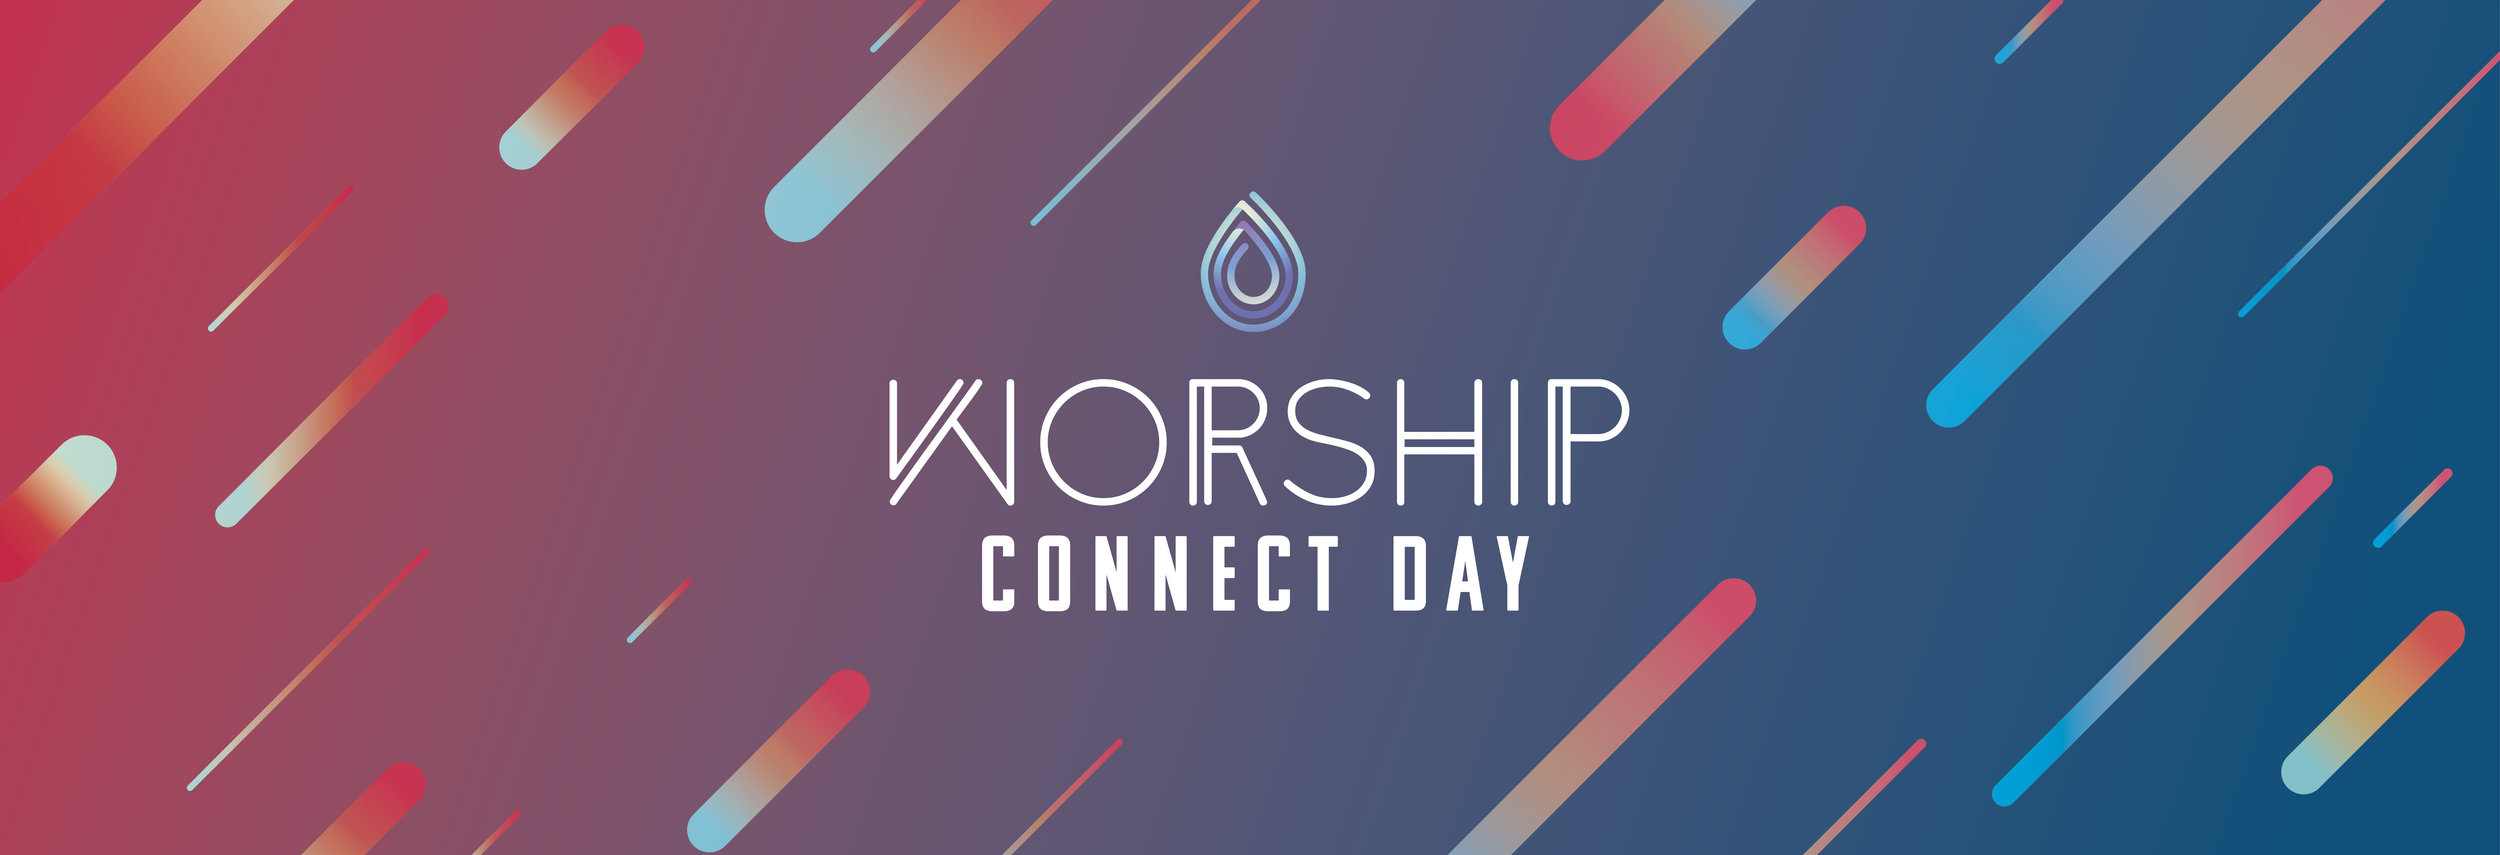 HT Web Event Headers_WorshipConnect.jpg